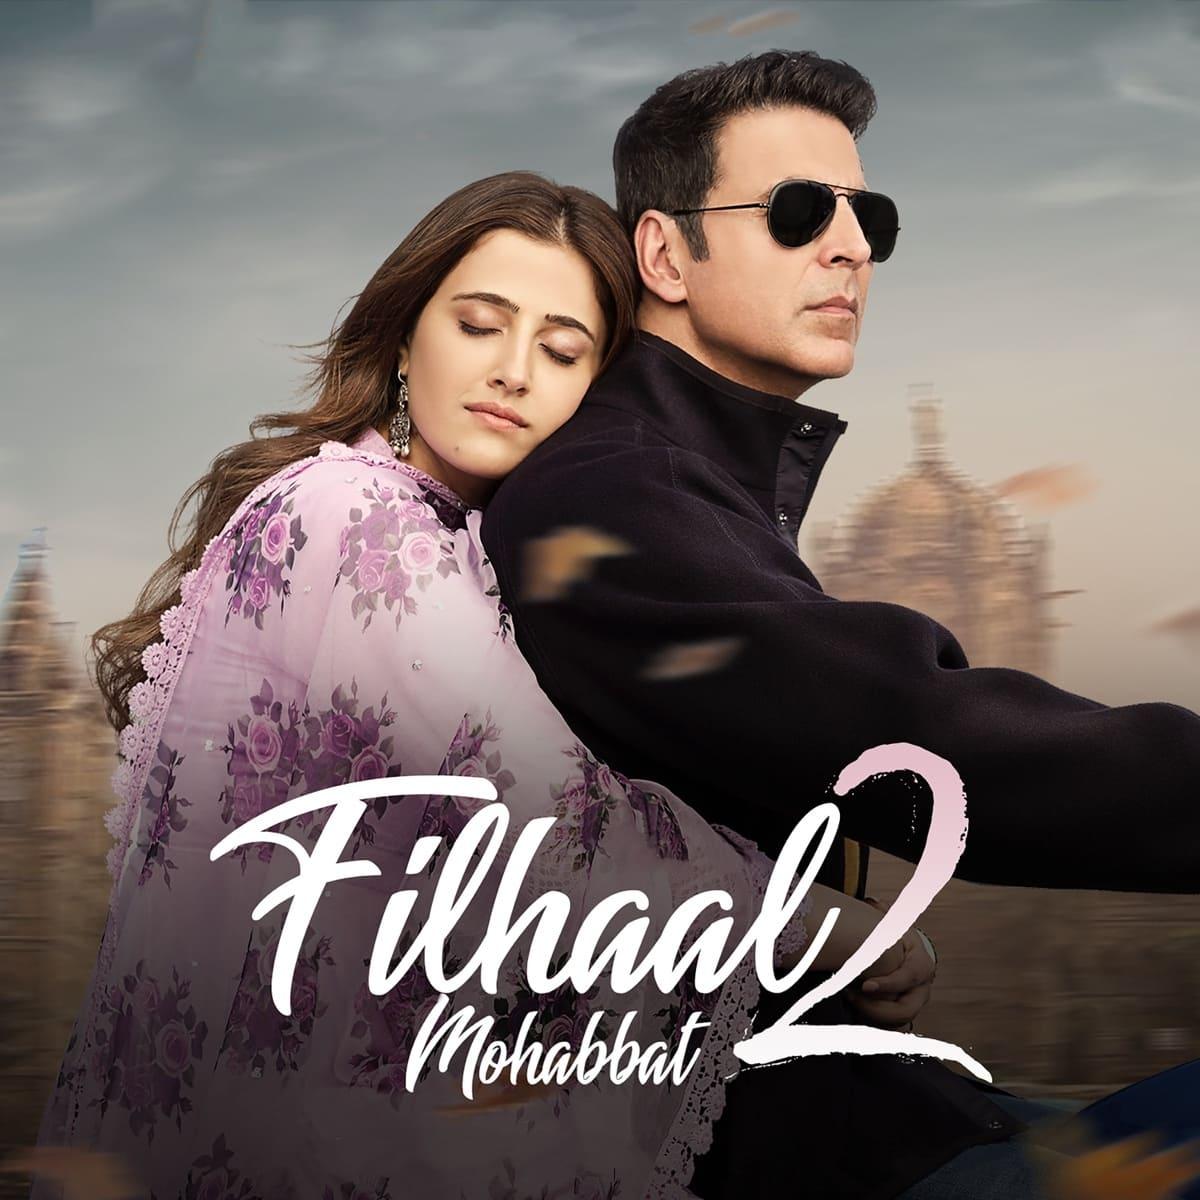 Filhaal 2 Akshay Kumar Mp3 Song Download 320kbps Free